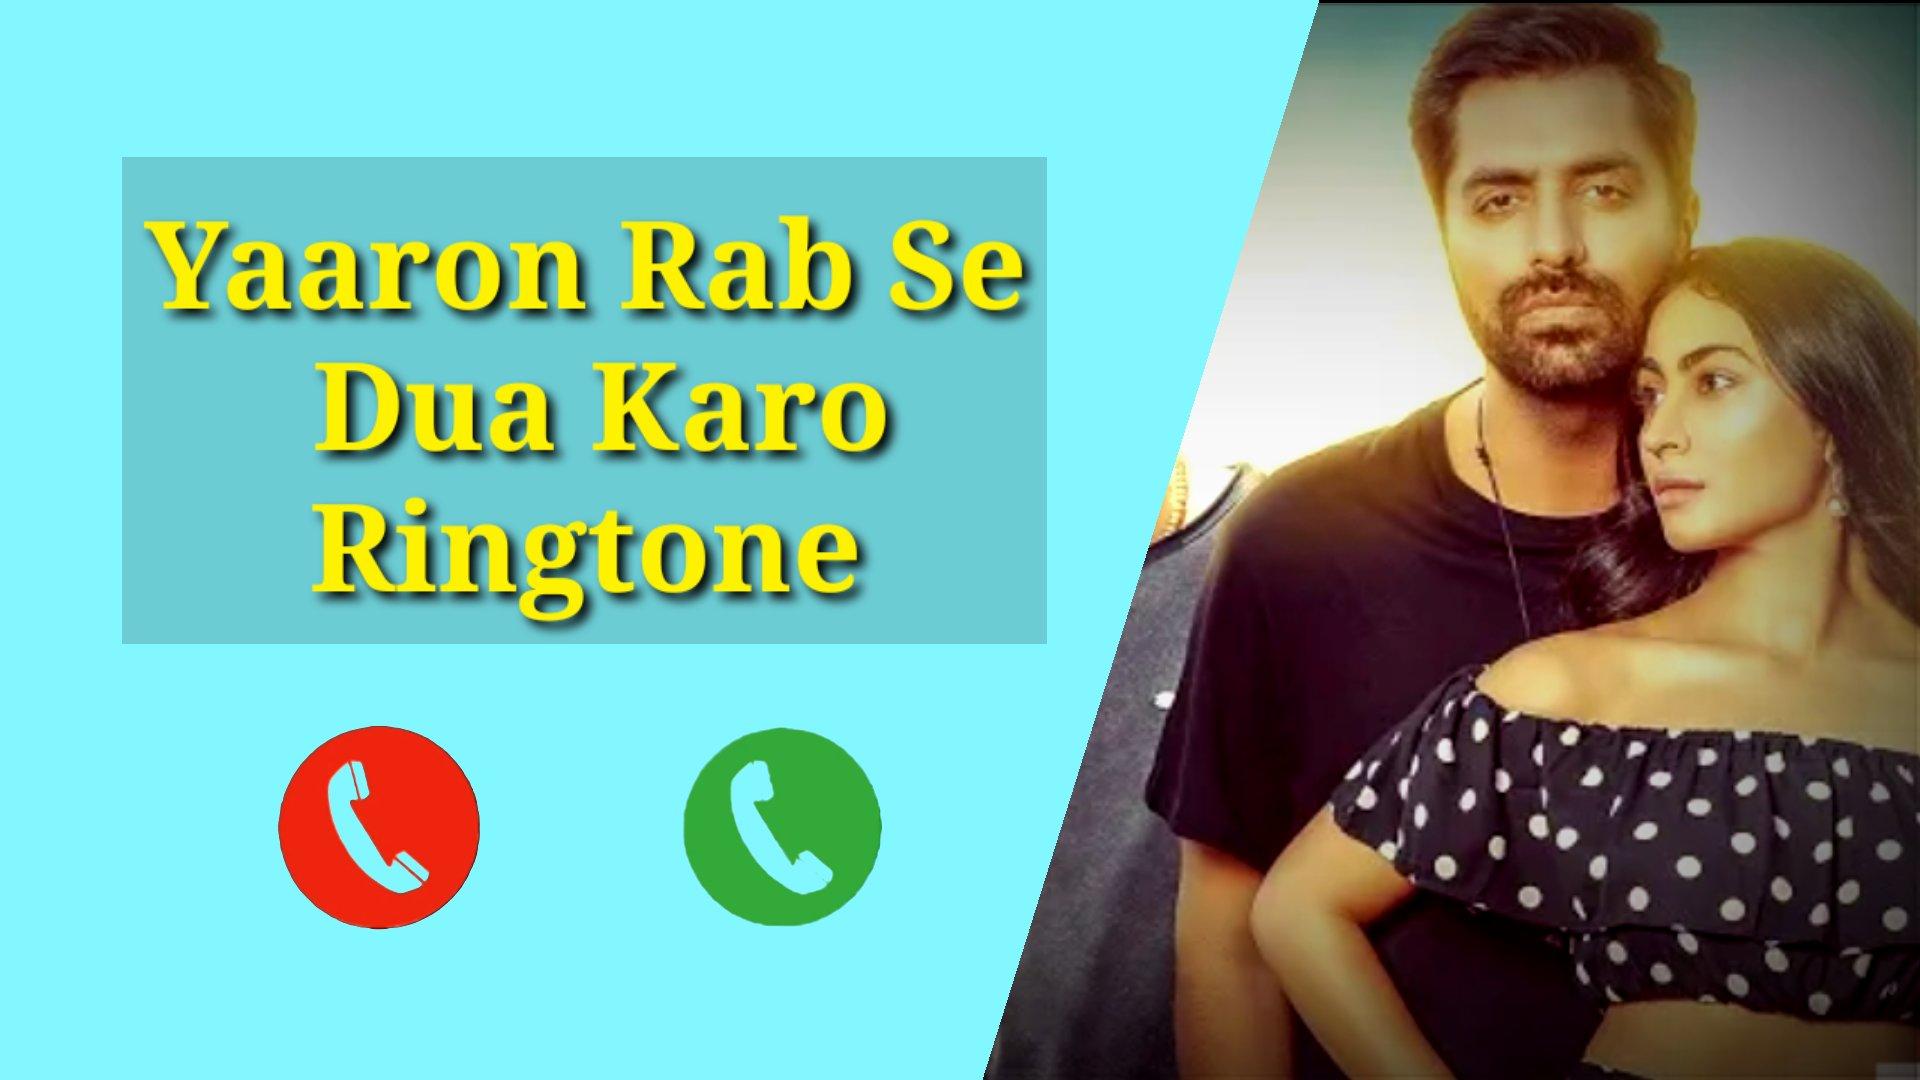 Yaaron Rab Se Dua Karo Mp3 Ringtone Download